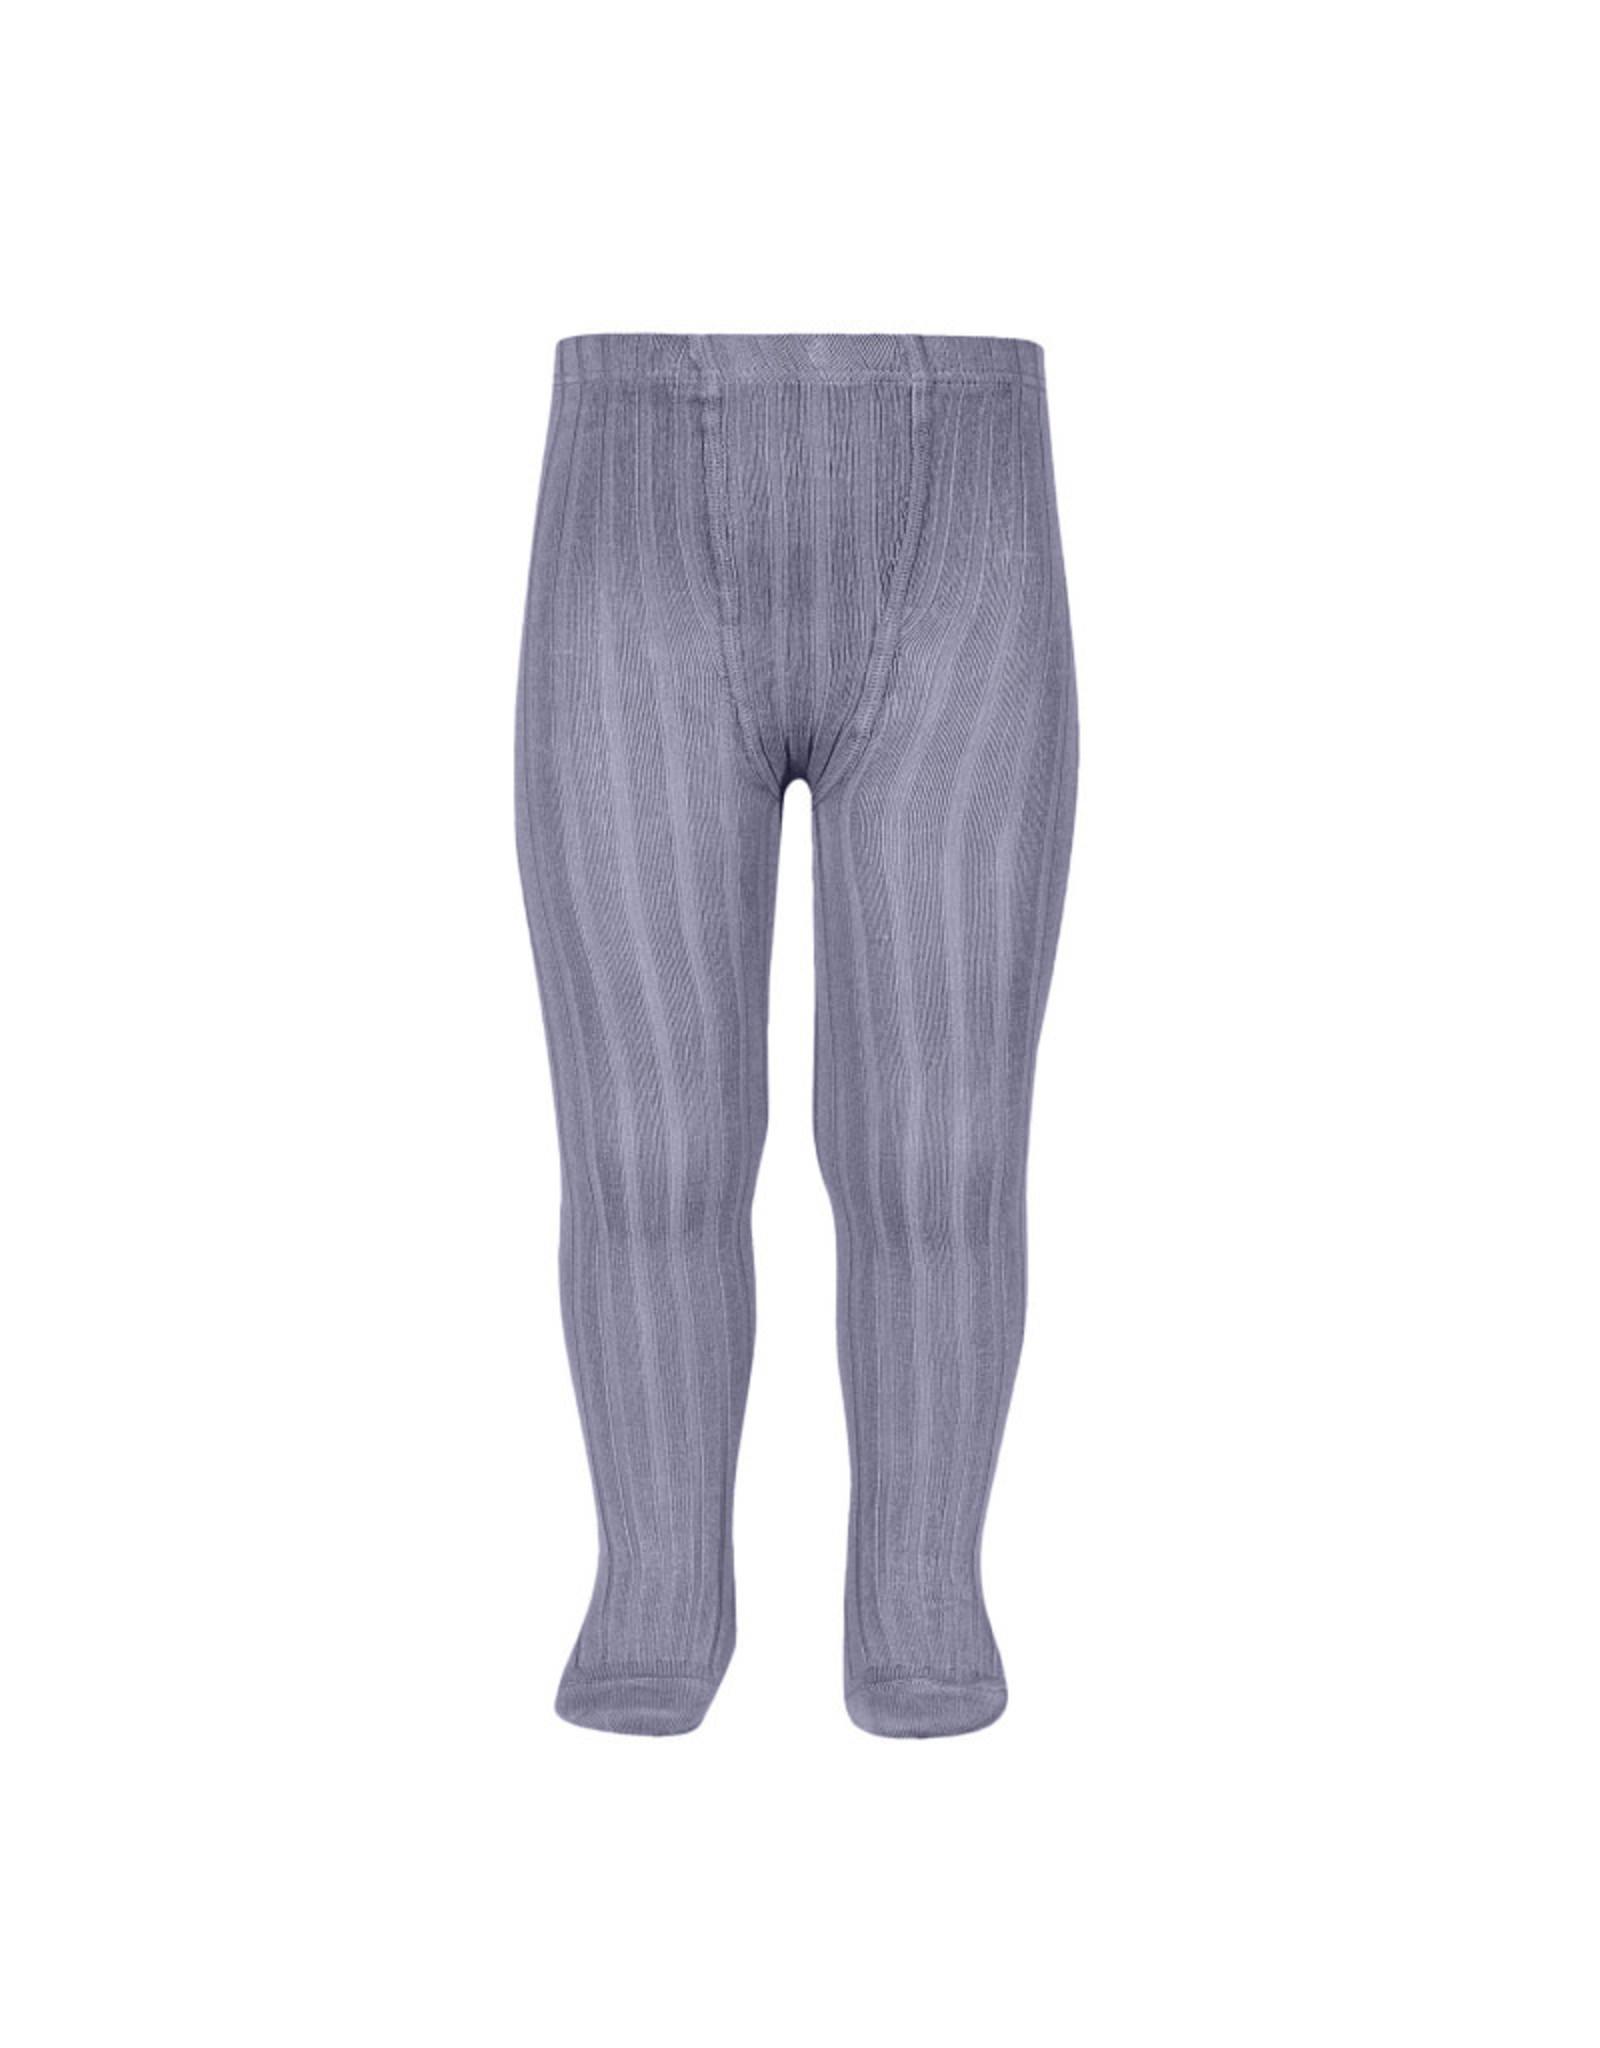 CONDOR Lavender Rib Tights